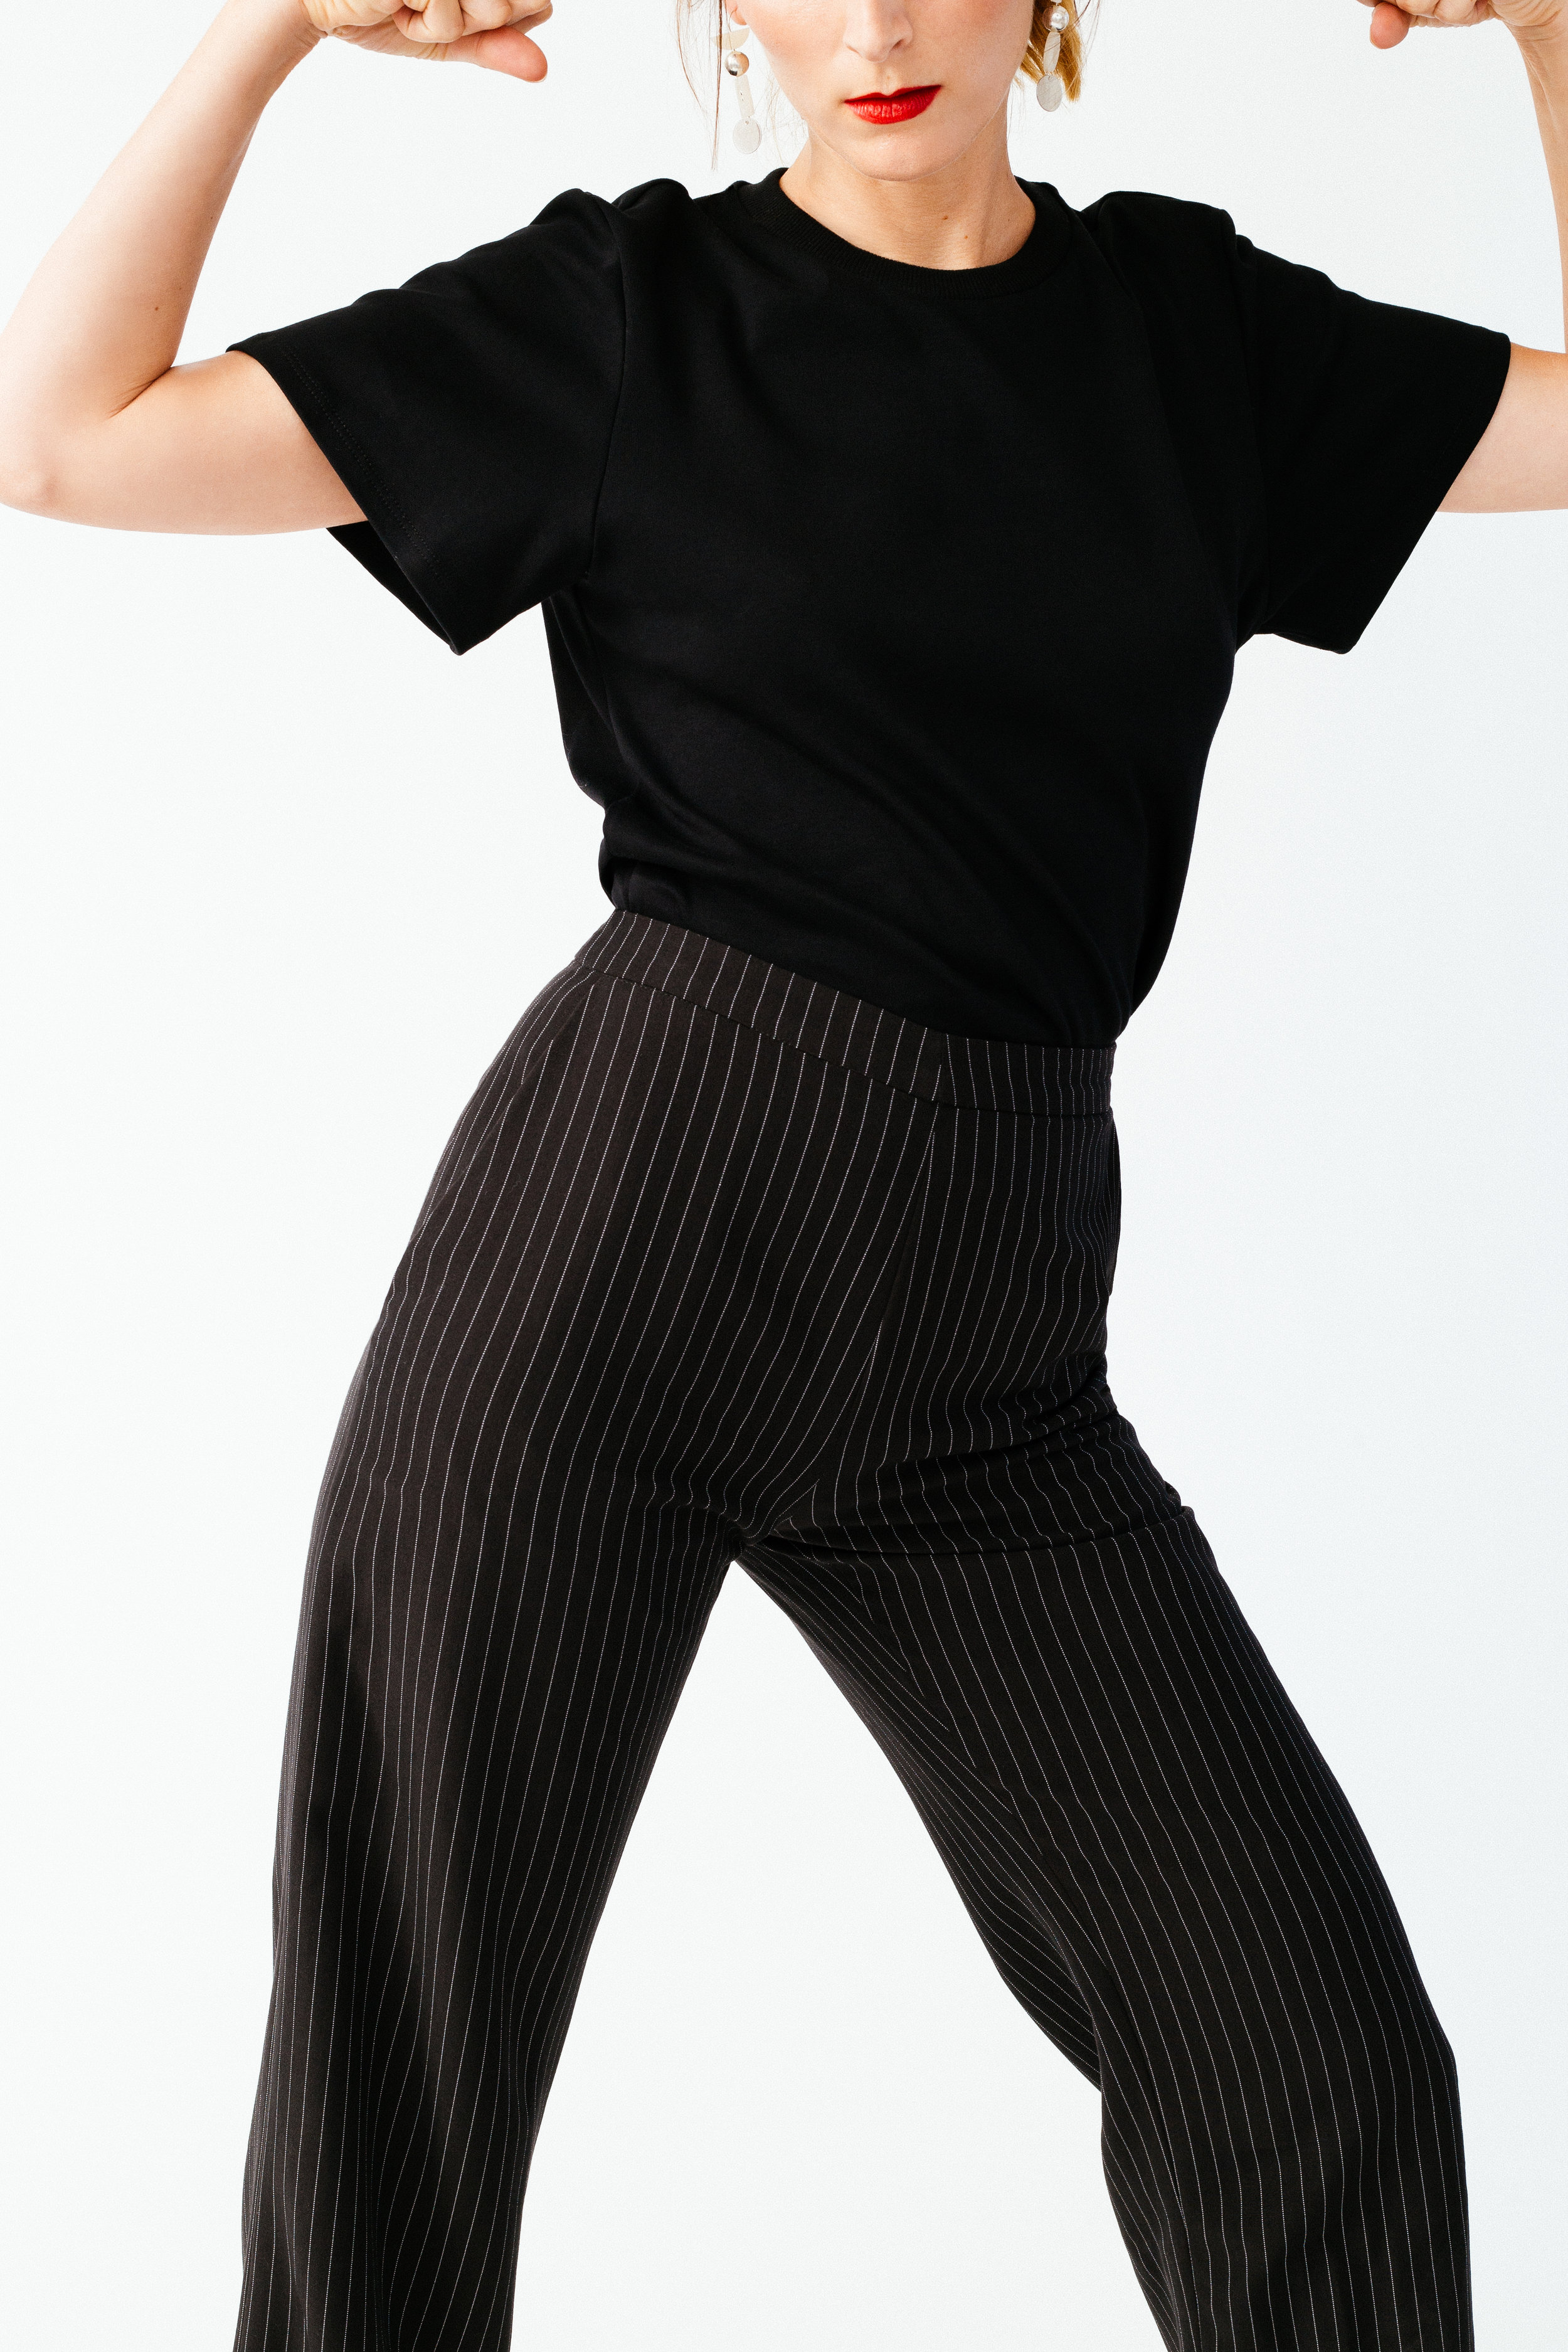 ellice ruiz_sustainable workwear_tshirts.jpg